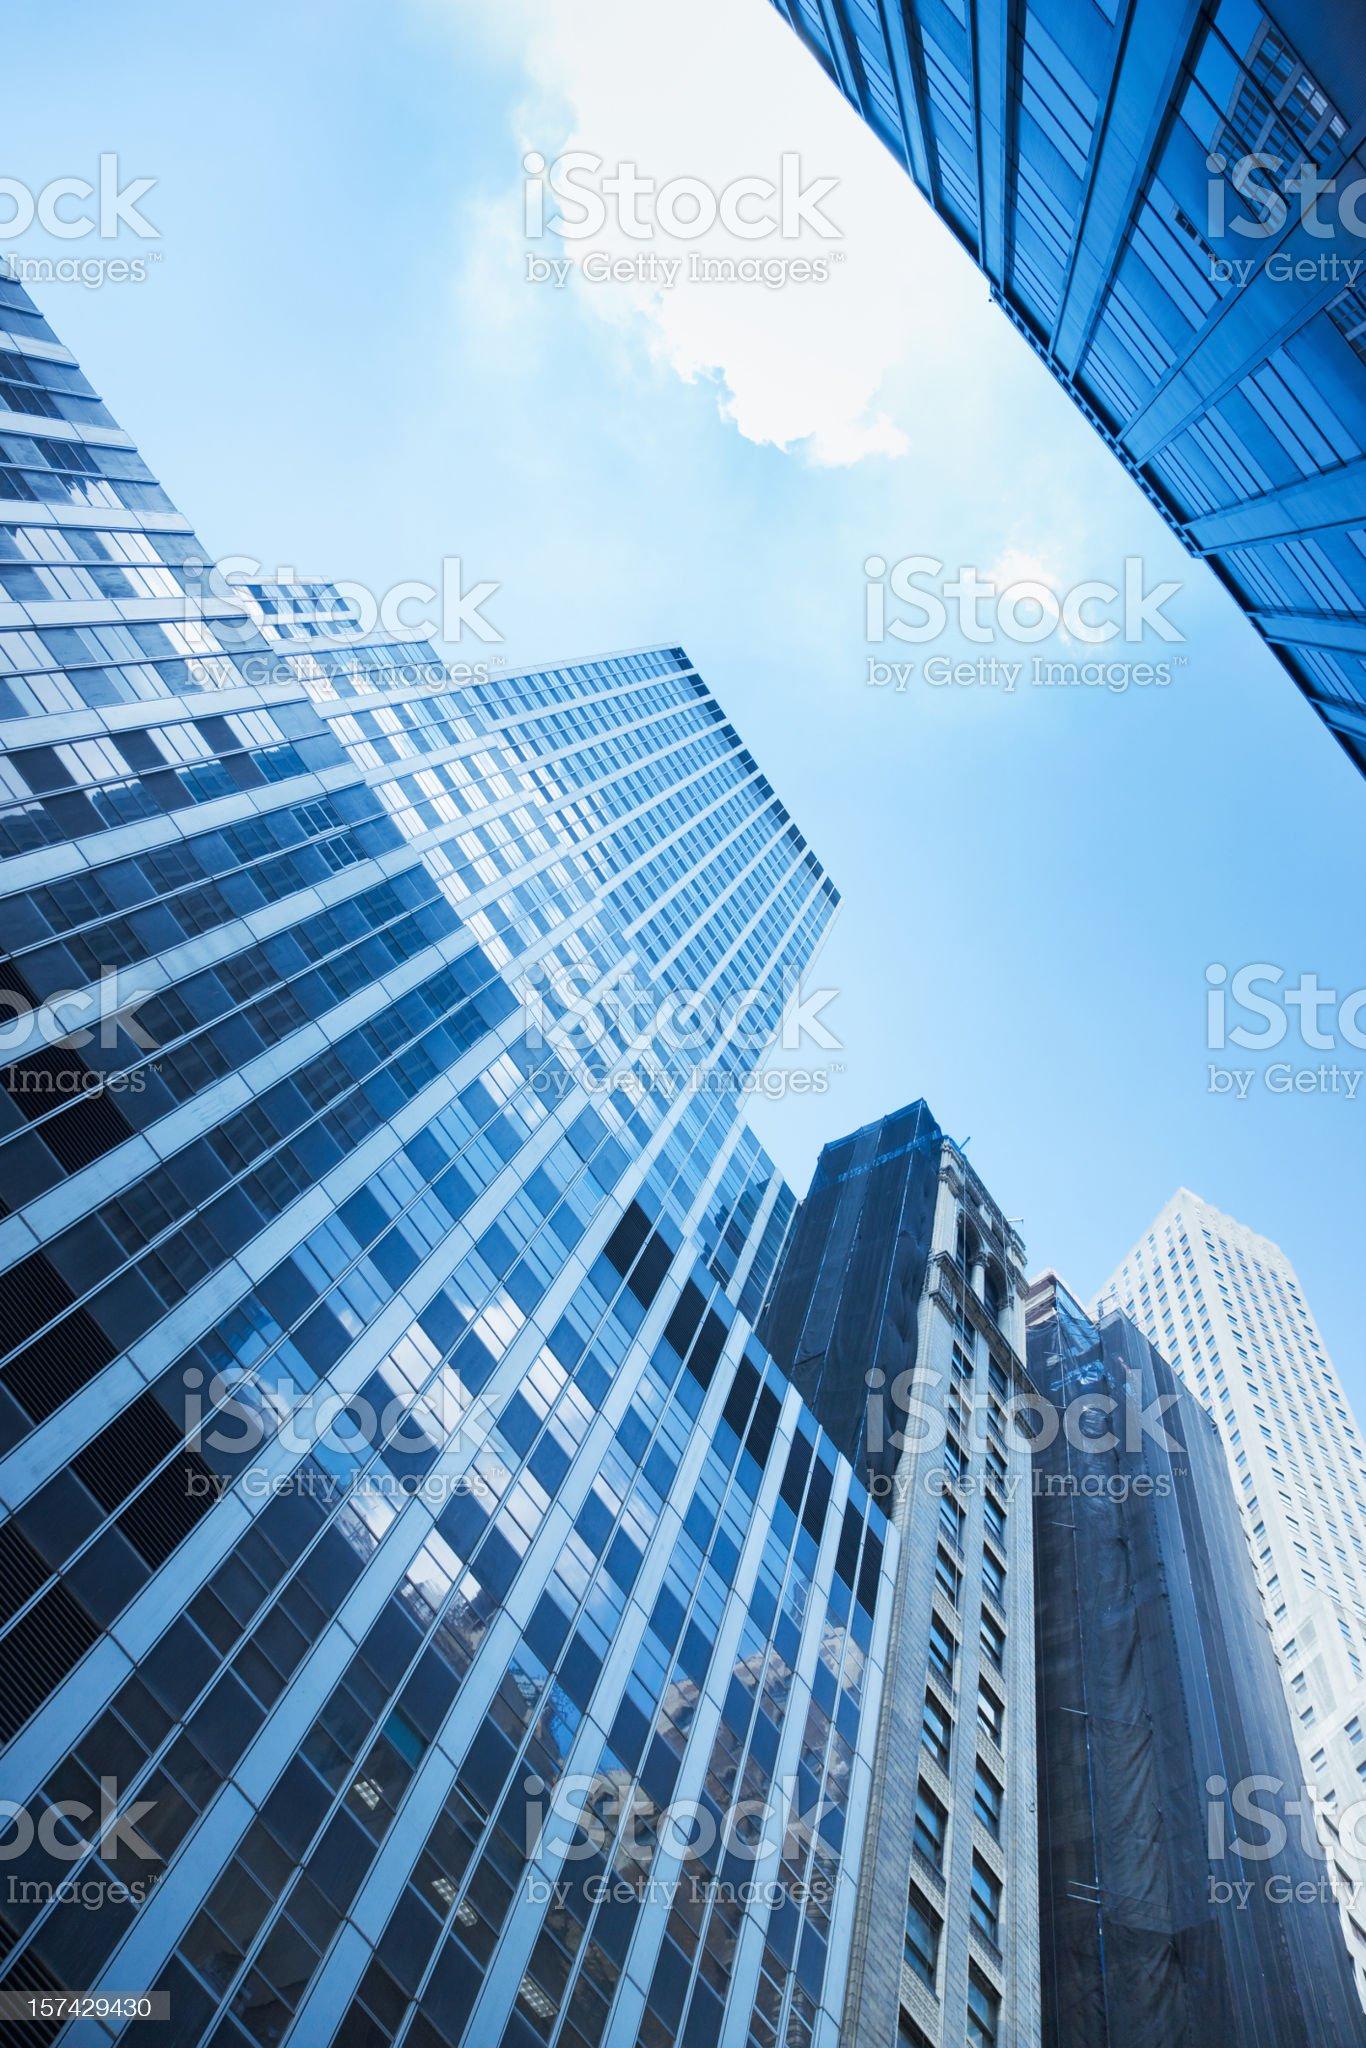 Blue Manhattan Skyscrapers New York City royalty-free stock photo